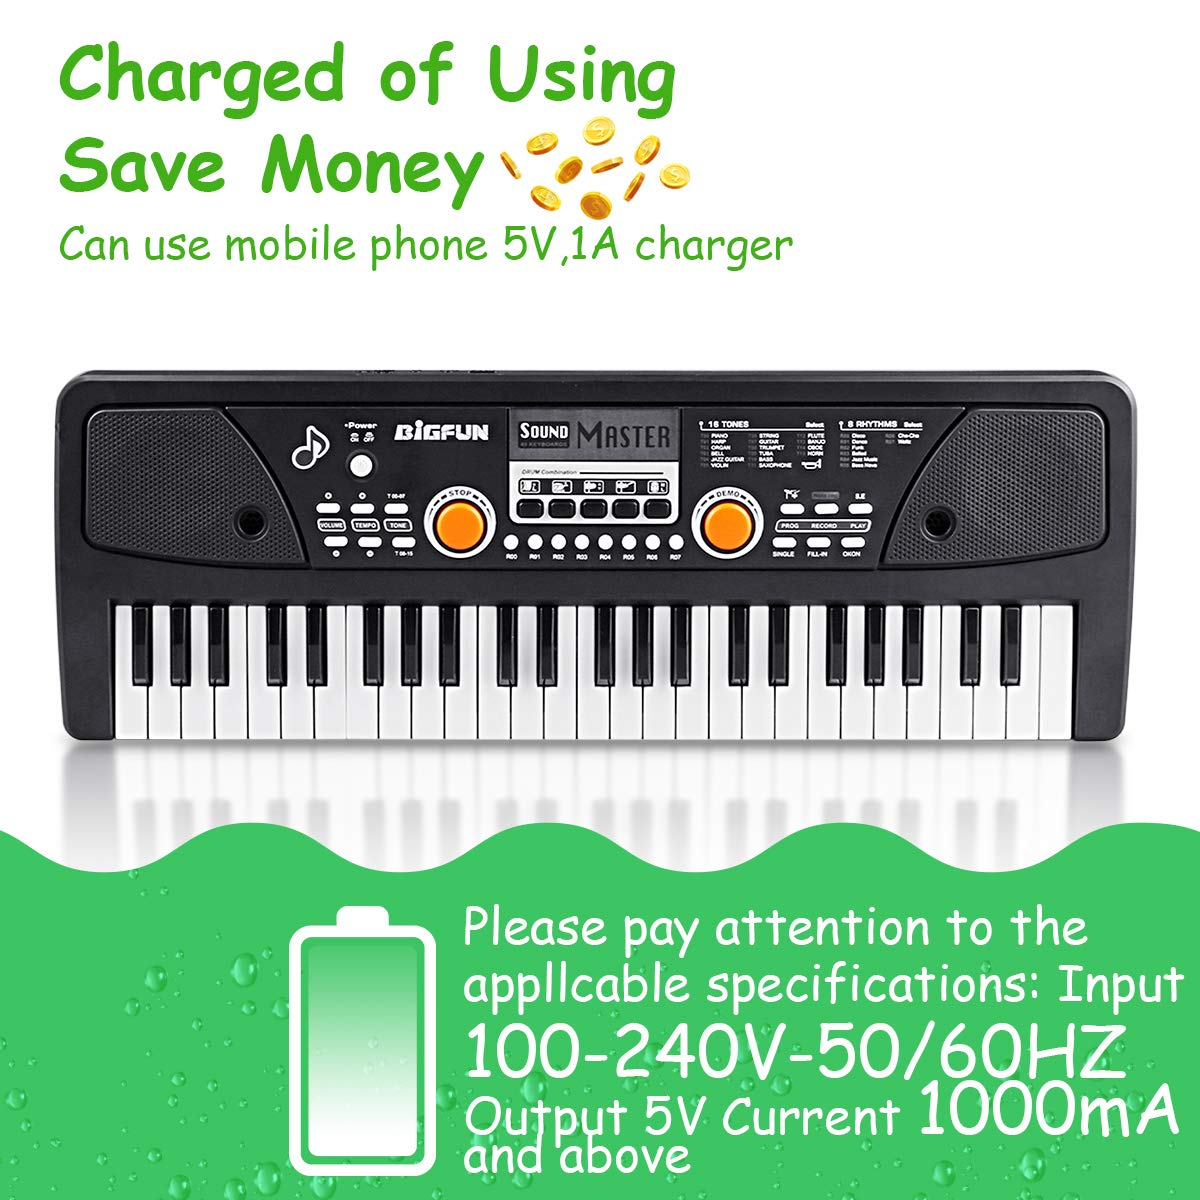 RenFox 49 Key Piano Keyboard Portable Electronic Kids Piano Keyboard Beginner Digital Music Piano Keyboard & Microphone Teaching Toy Gift for Kids Boy Girl by RenFox (Image #2)